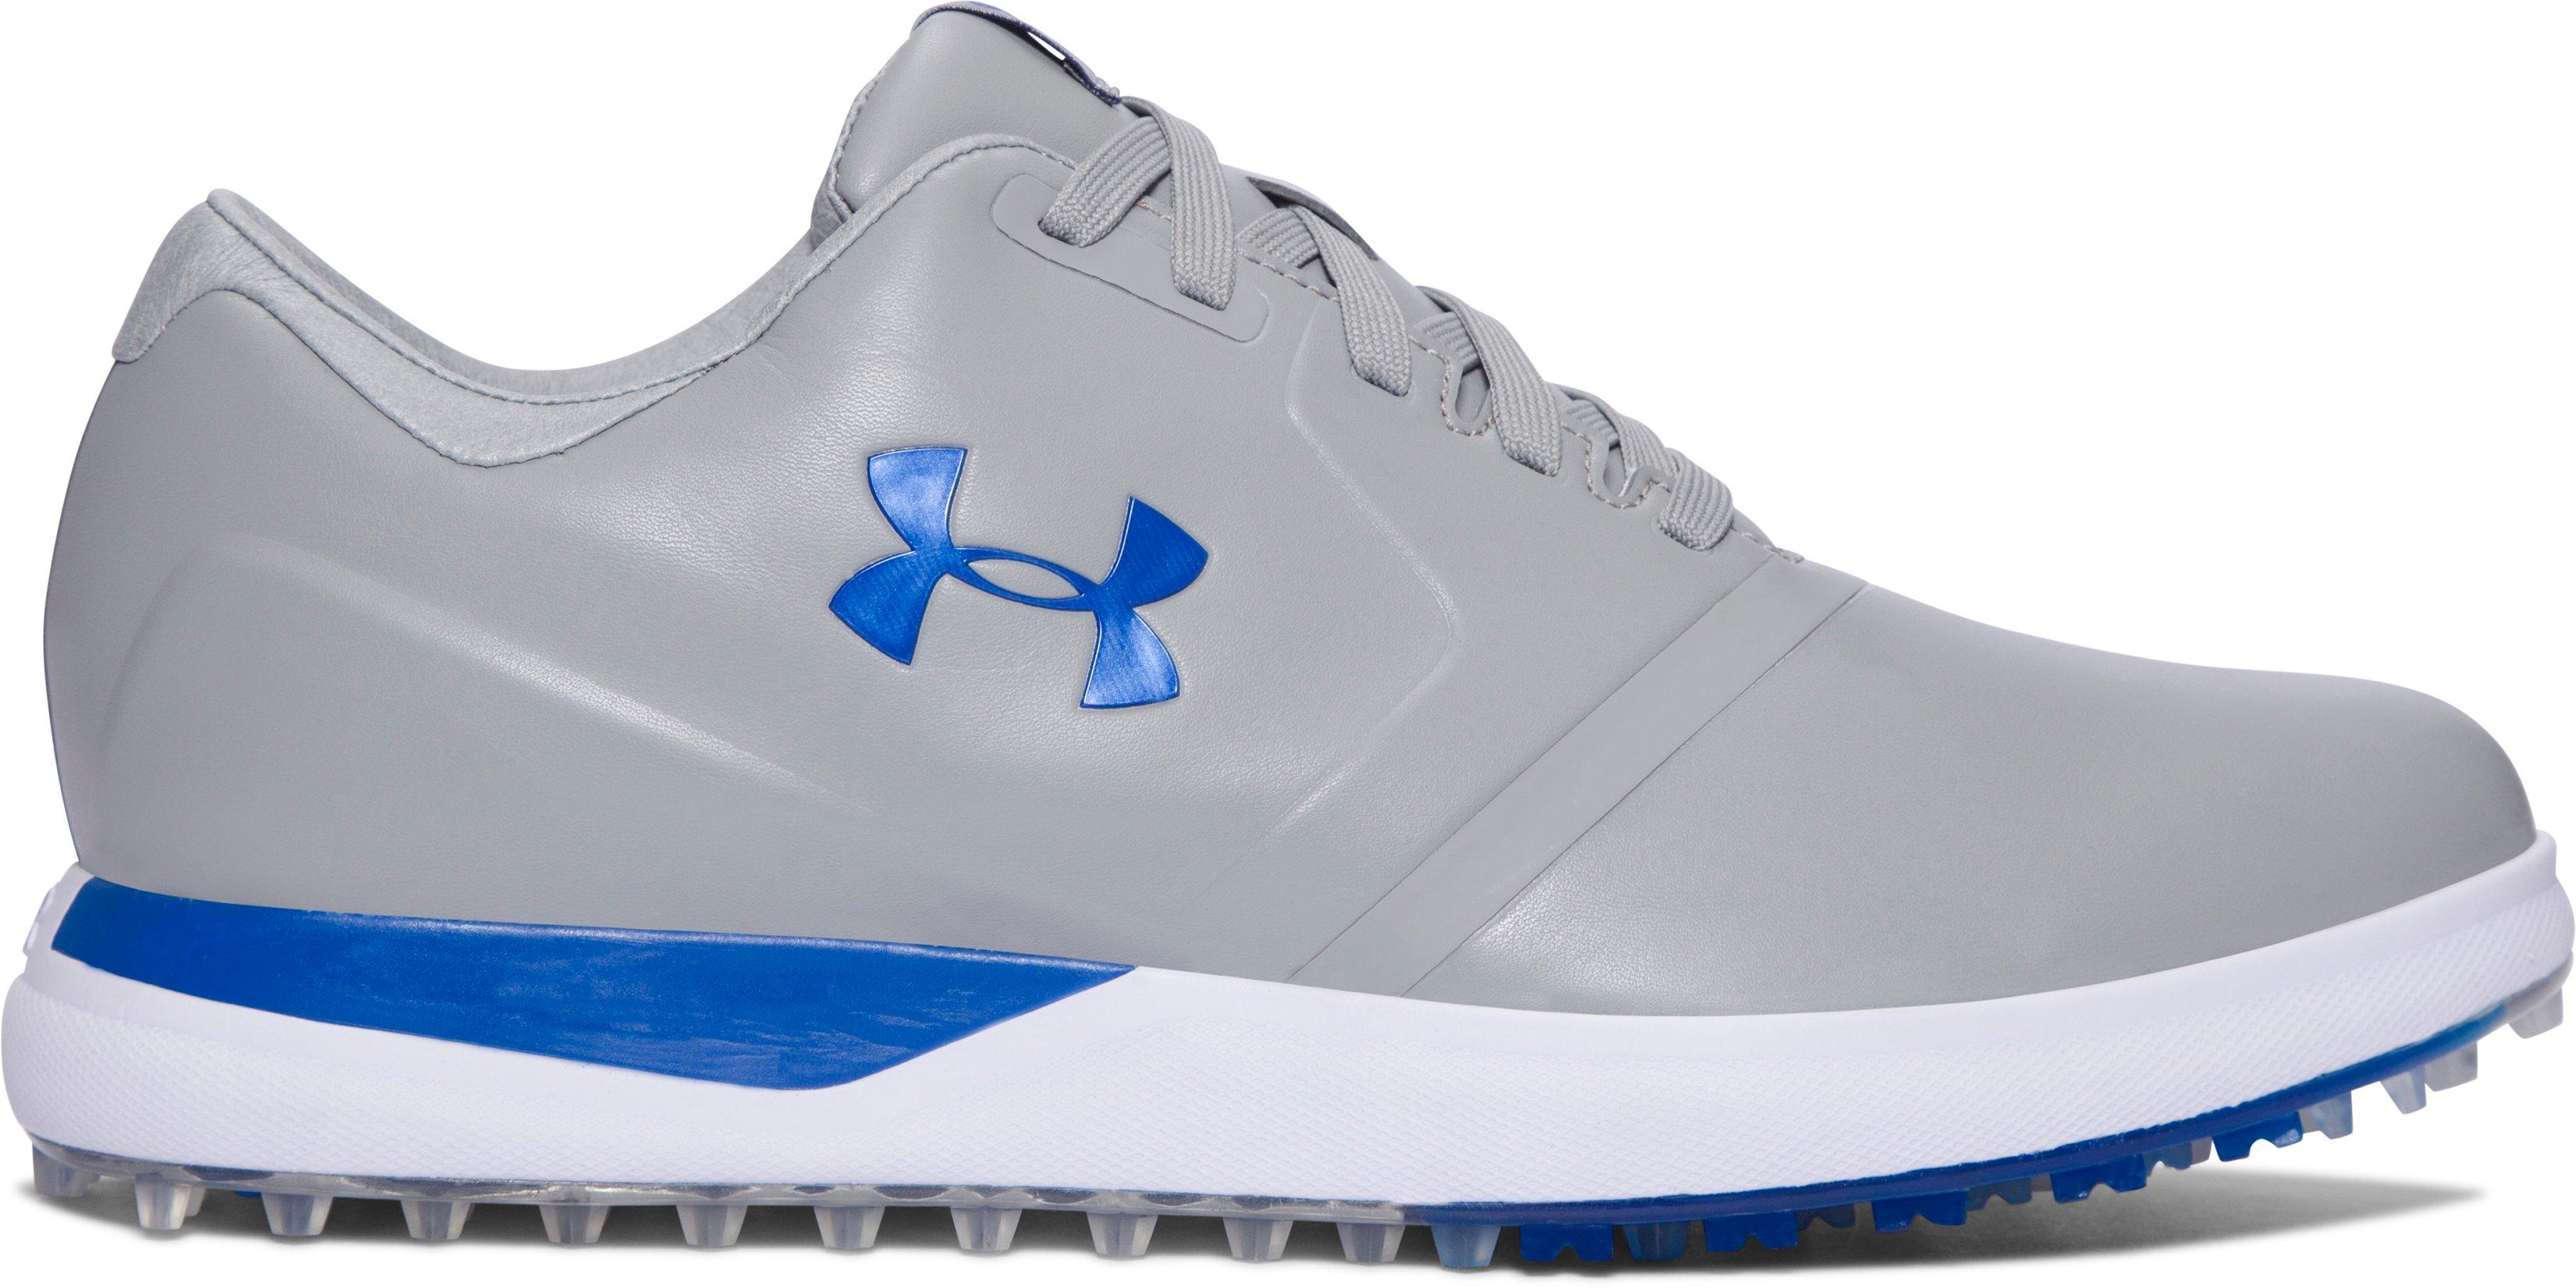 Men's UA Performance Spikeless Golf Shoes, 360 degree view